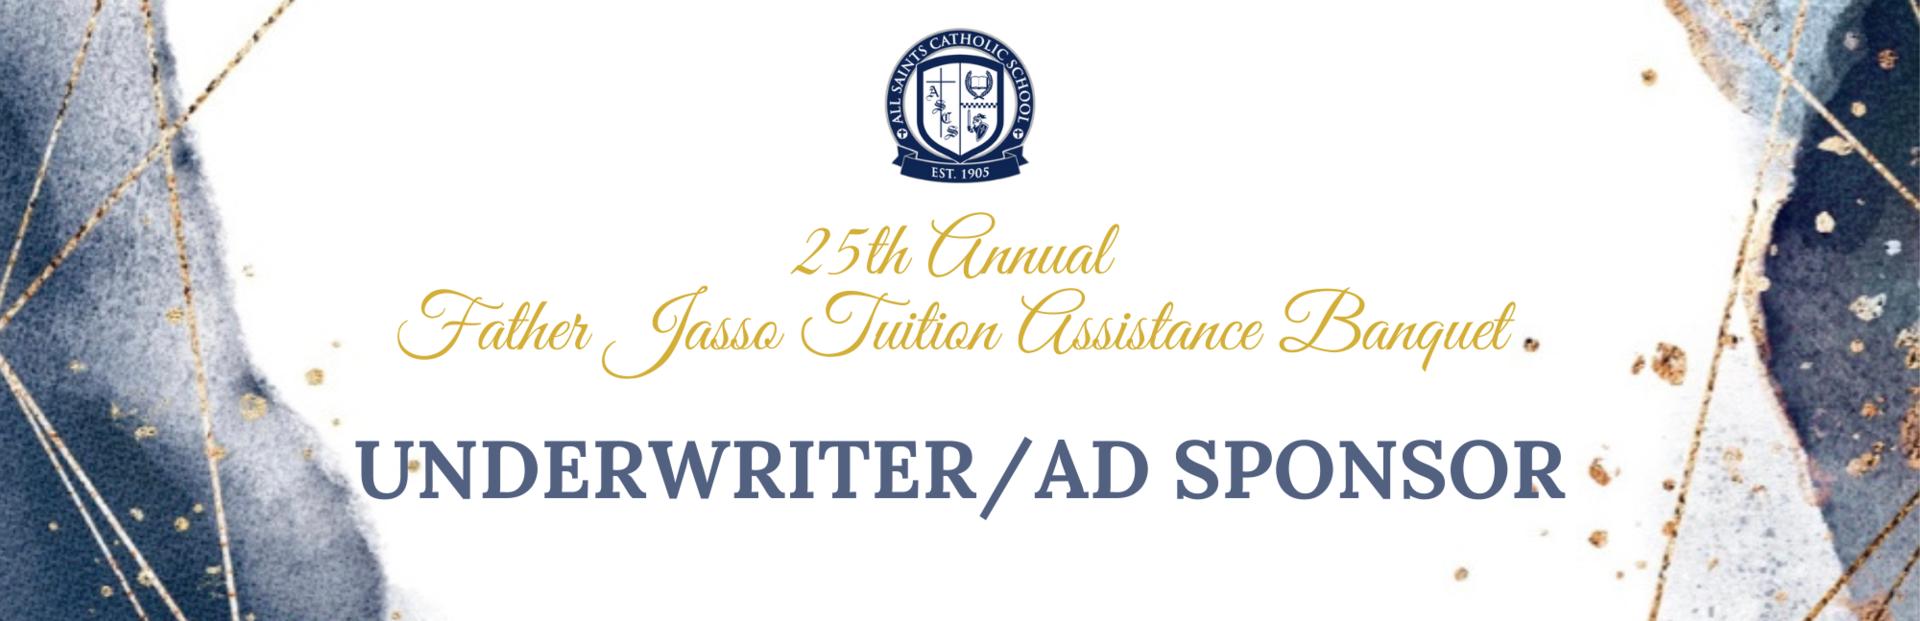 Underwriter/Ad Sponsor